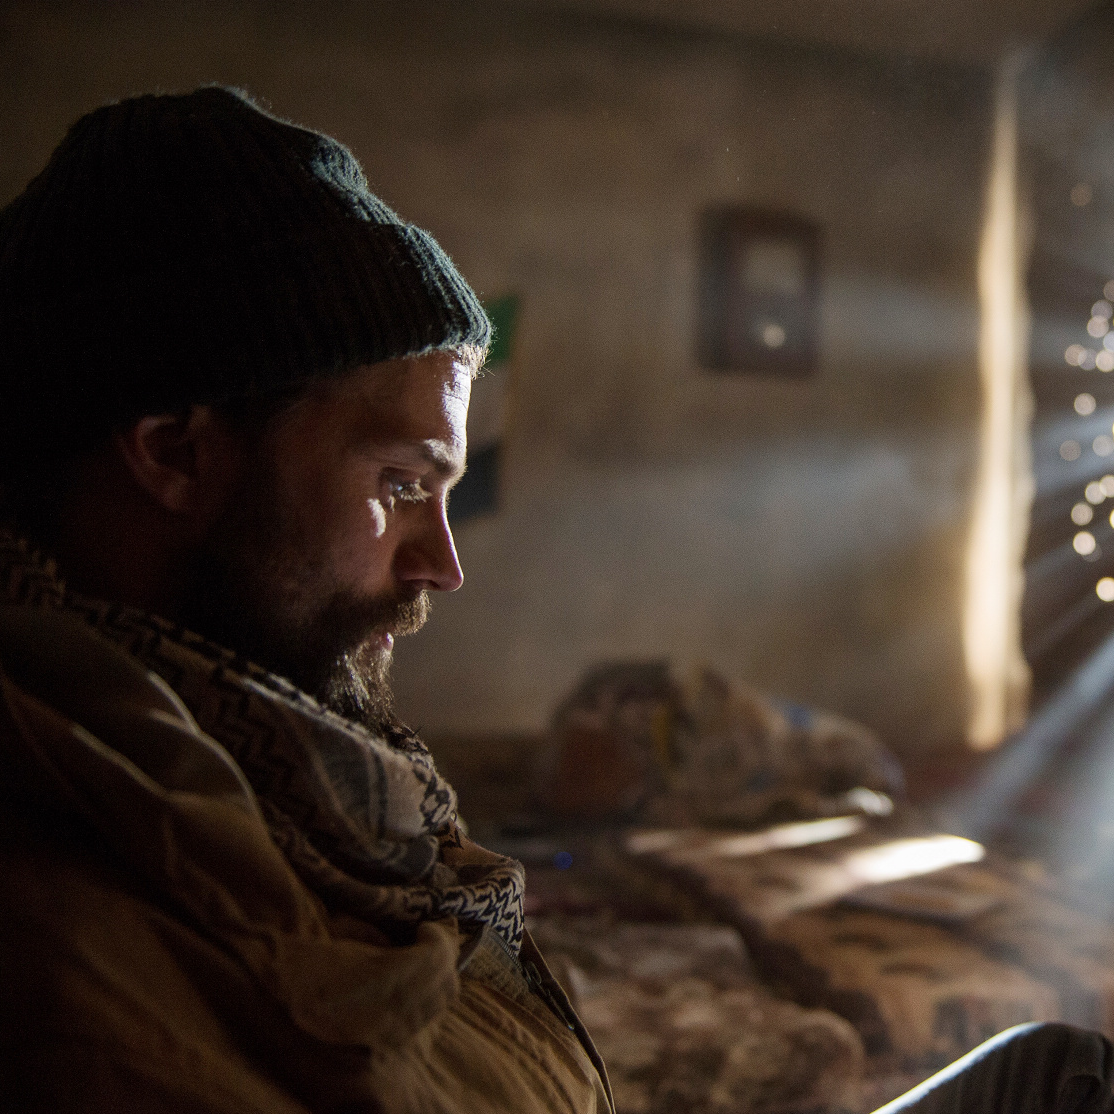 <p>傳奇戰地攝影記者竟成劇照師 傑米道南:「我演的角色正在拍我!」</p>